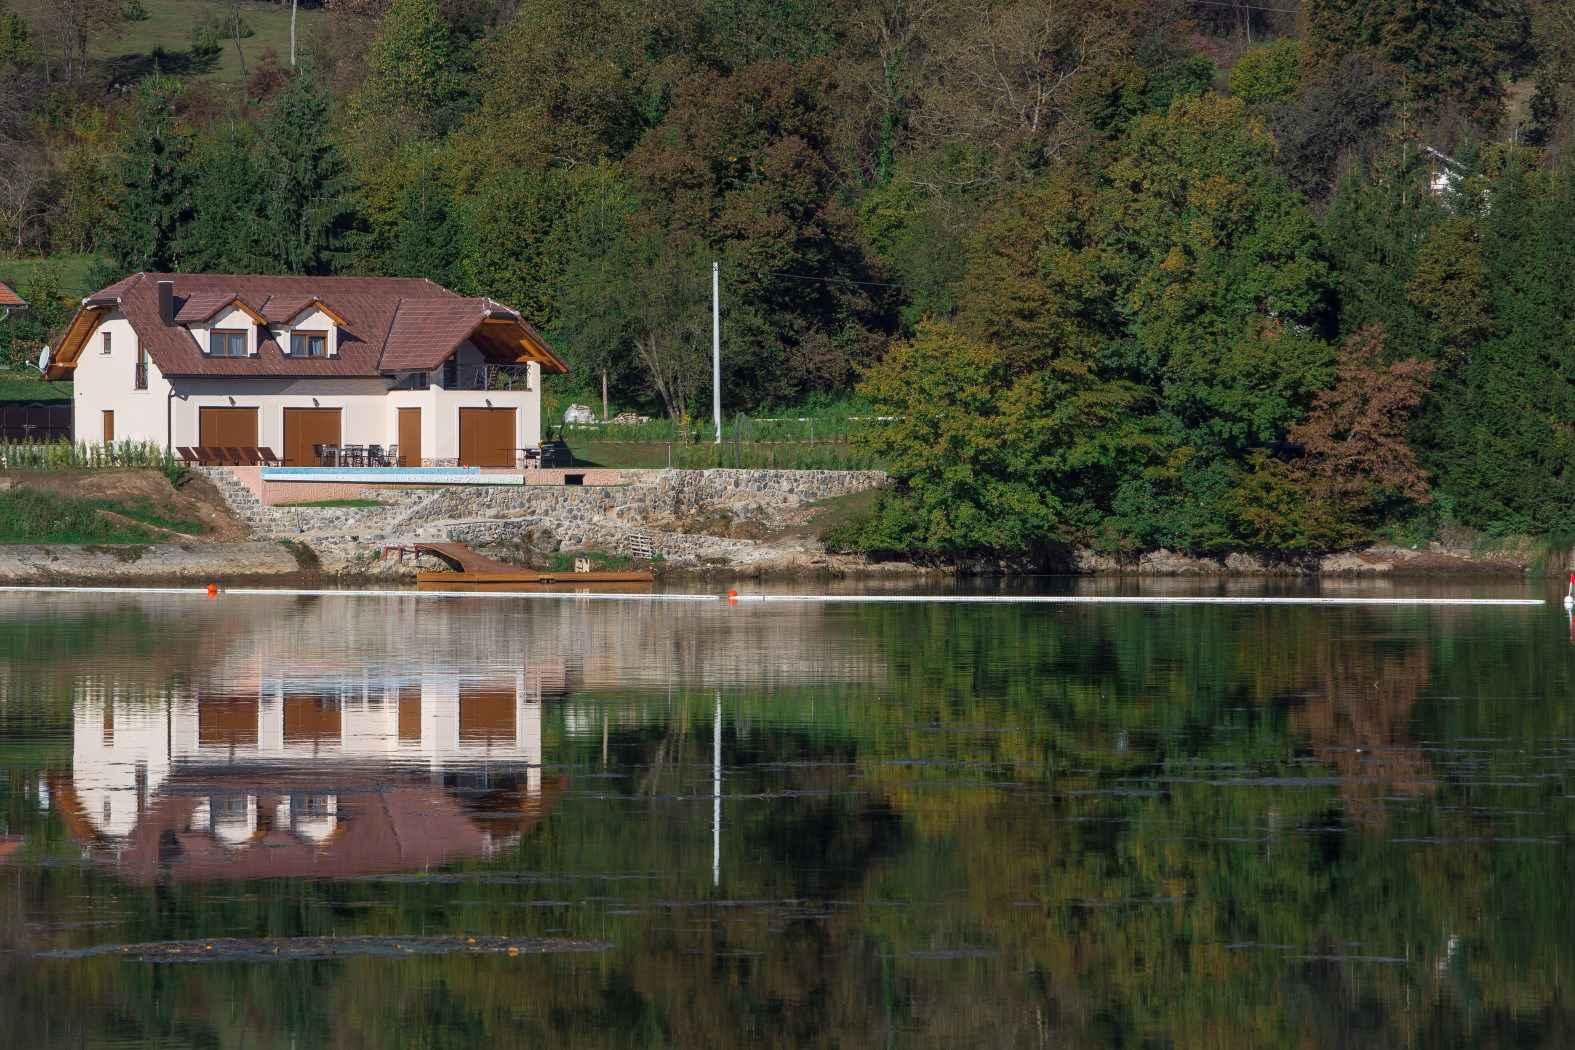 Ferienhaus mit Pool am See gelegen (2047240), Ogulin, , Mittelkroatien, Kroatien, Bild 4